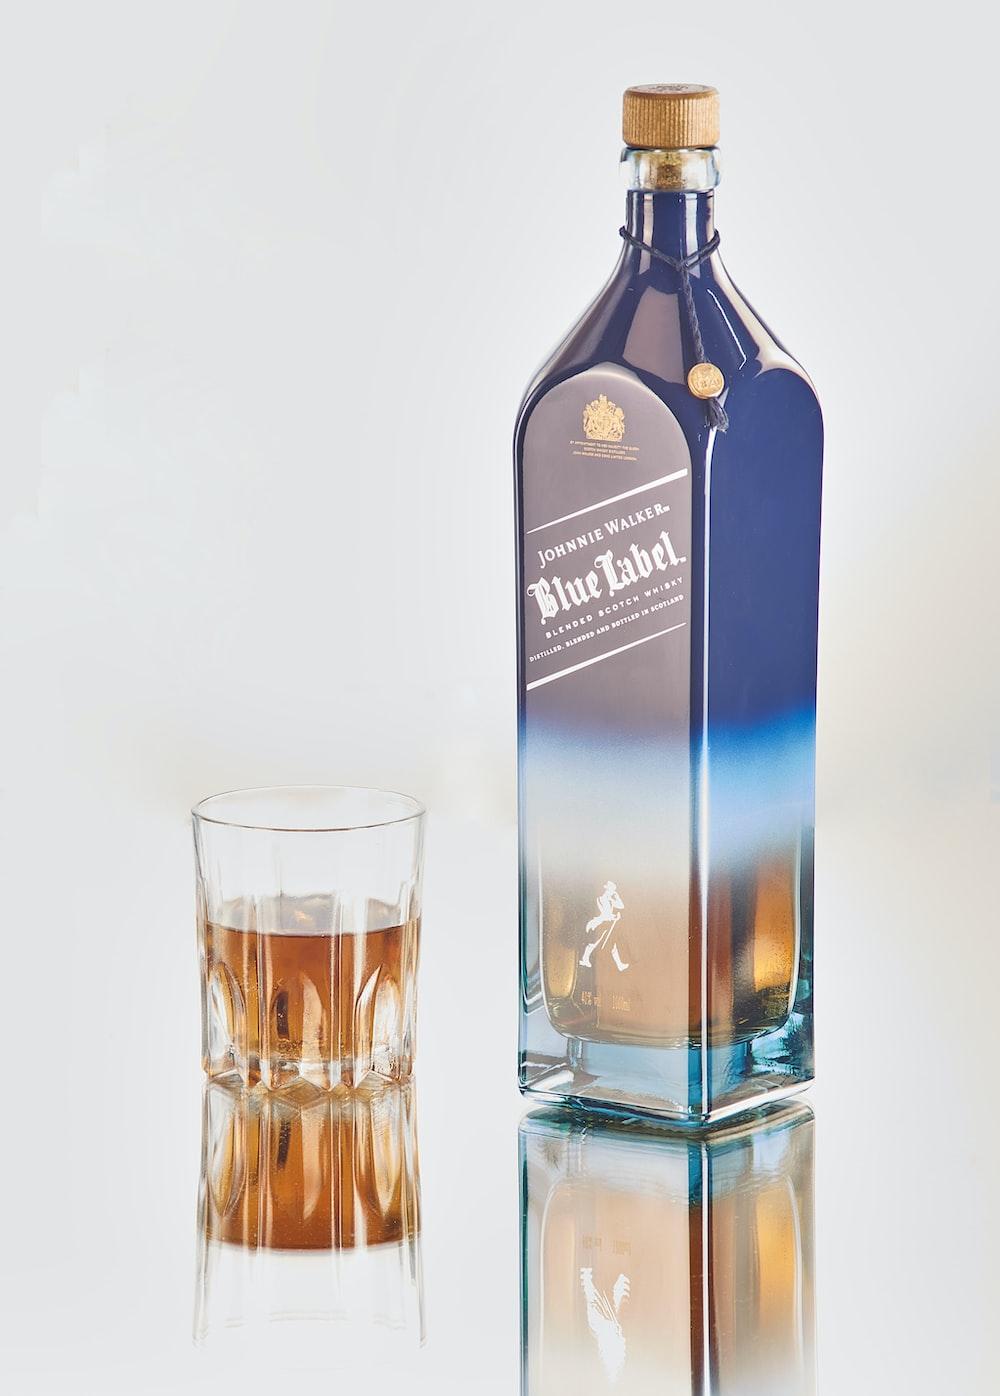 Jack Daniel's Blue Label bottle